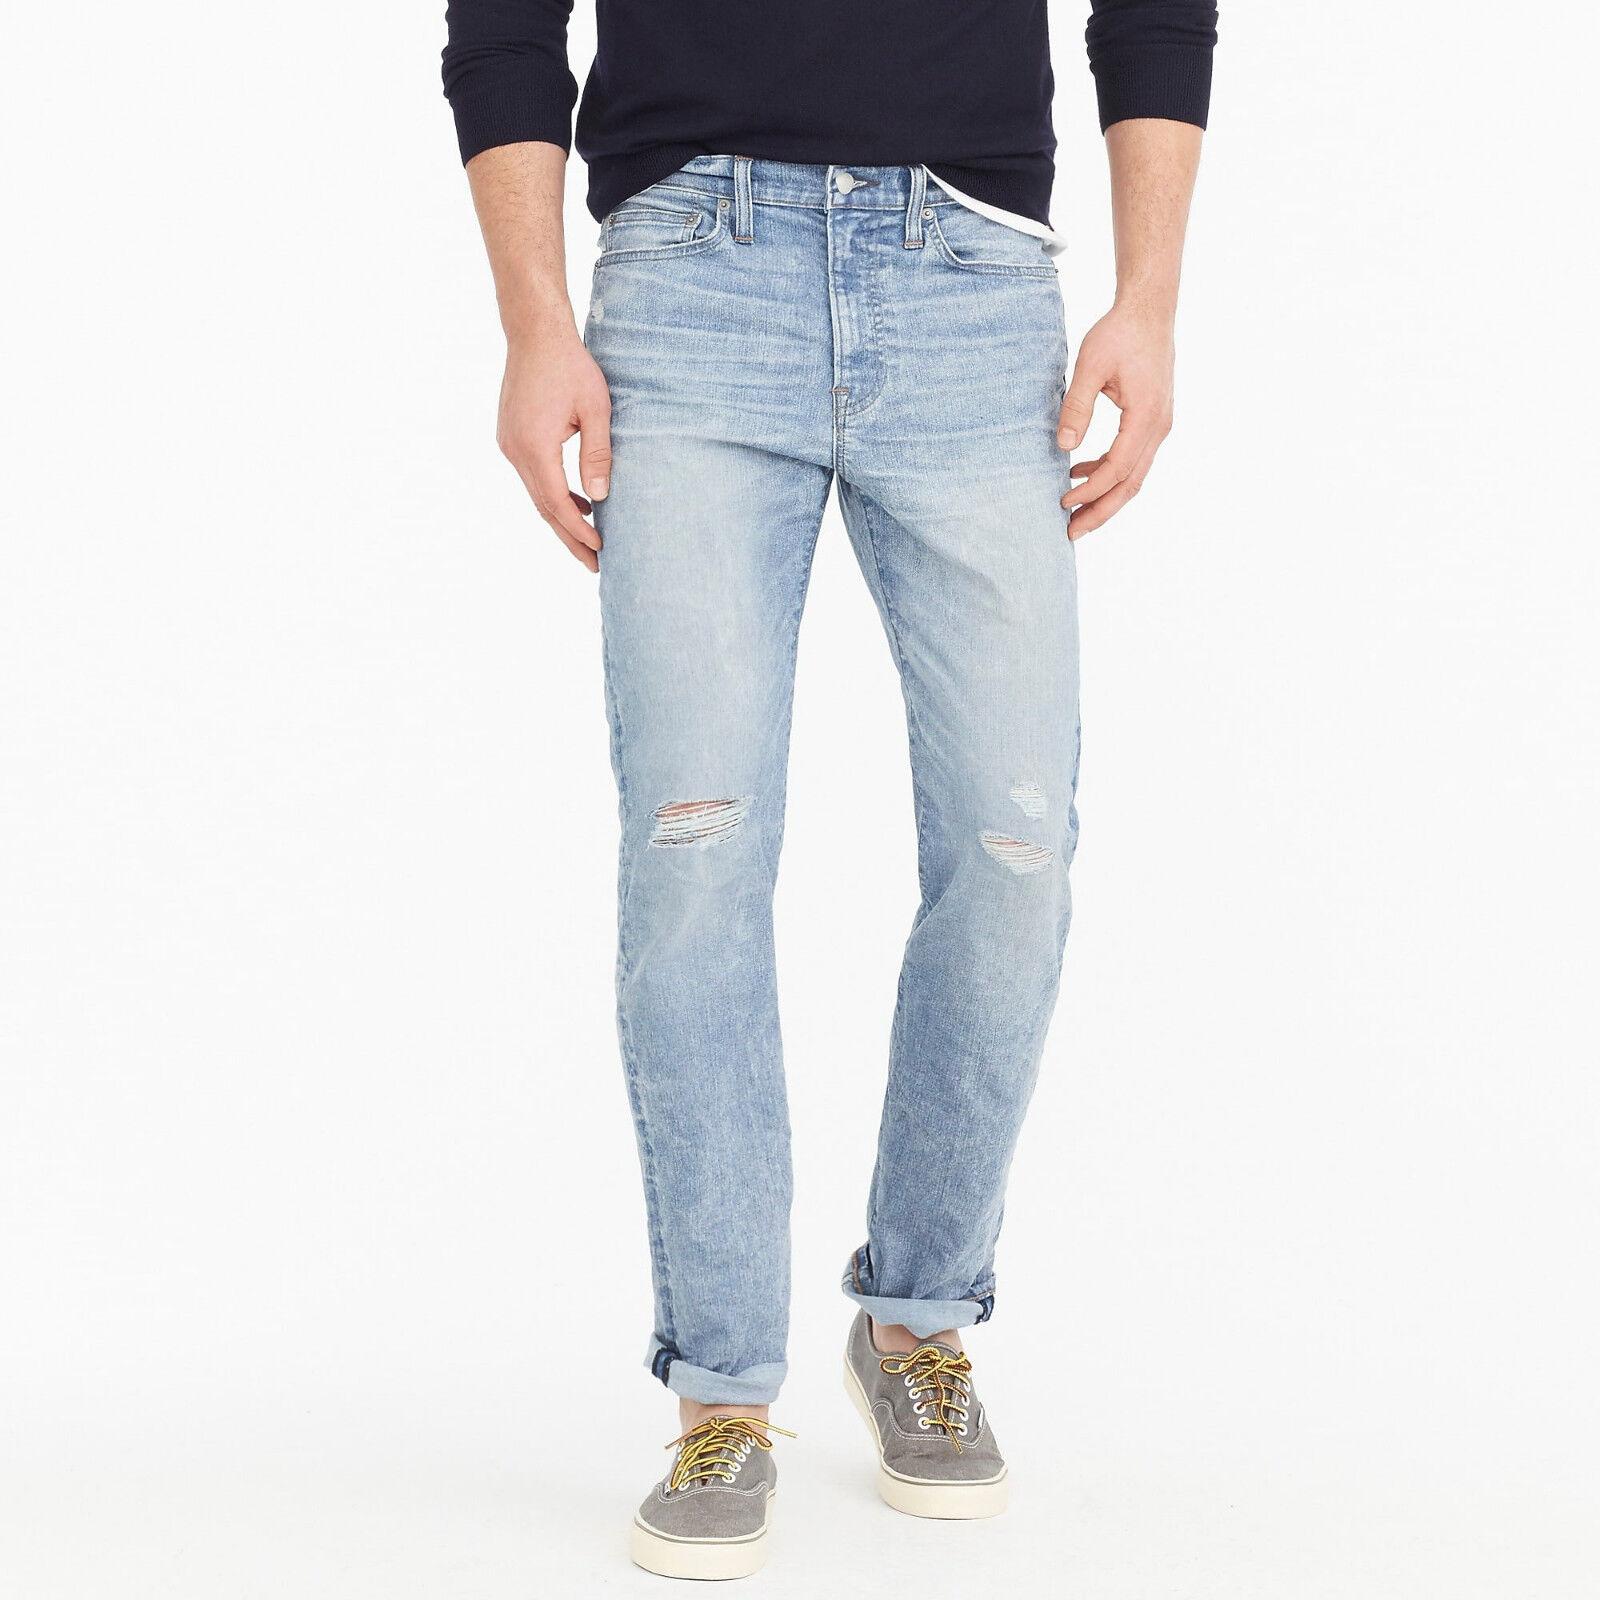 J. Crew 770 Cone Denim Men's Straight-fit Distressed Stretch Jeans NEW 34x30